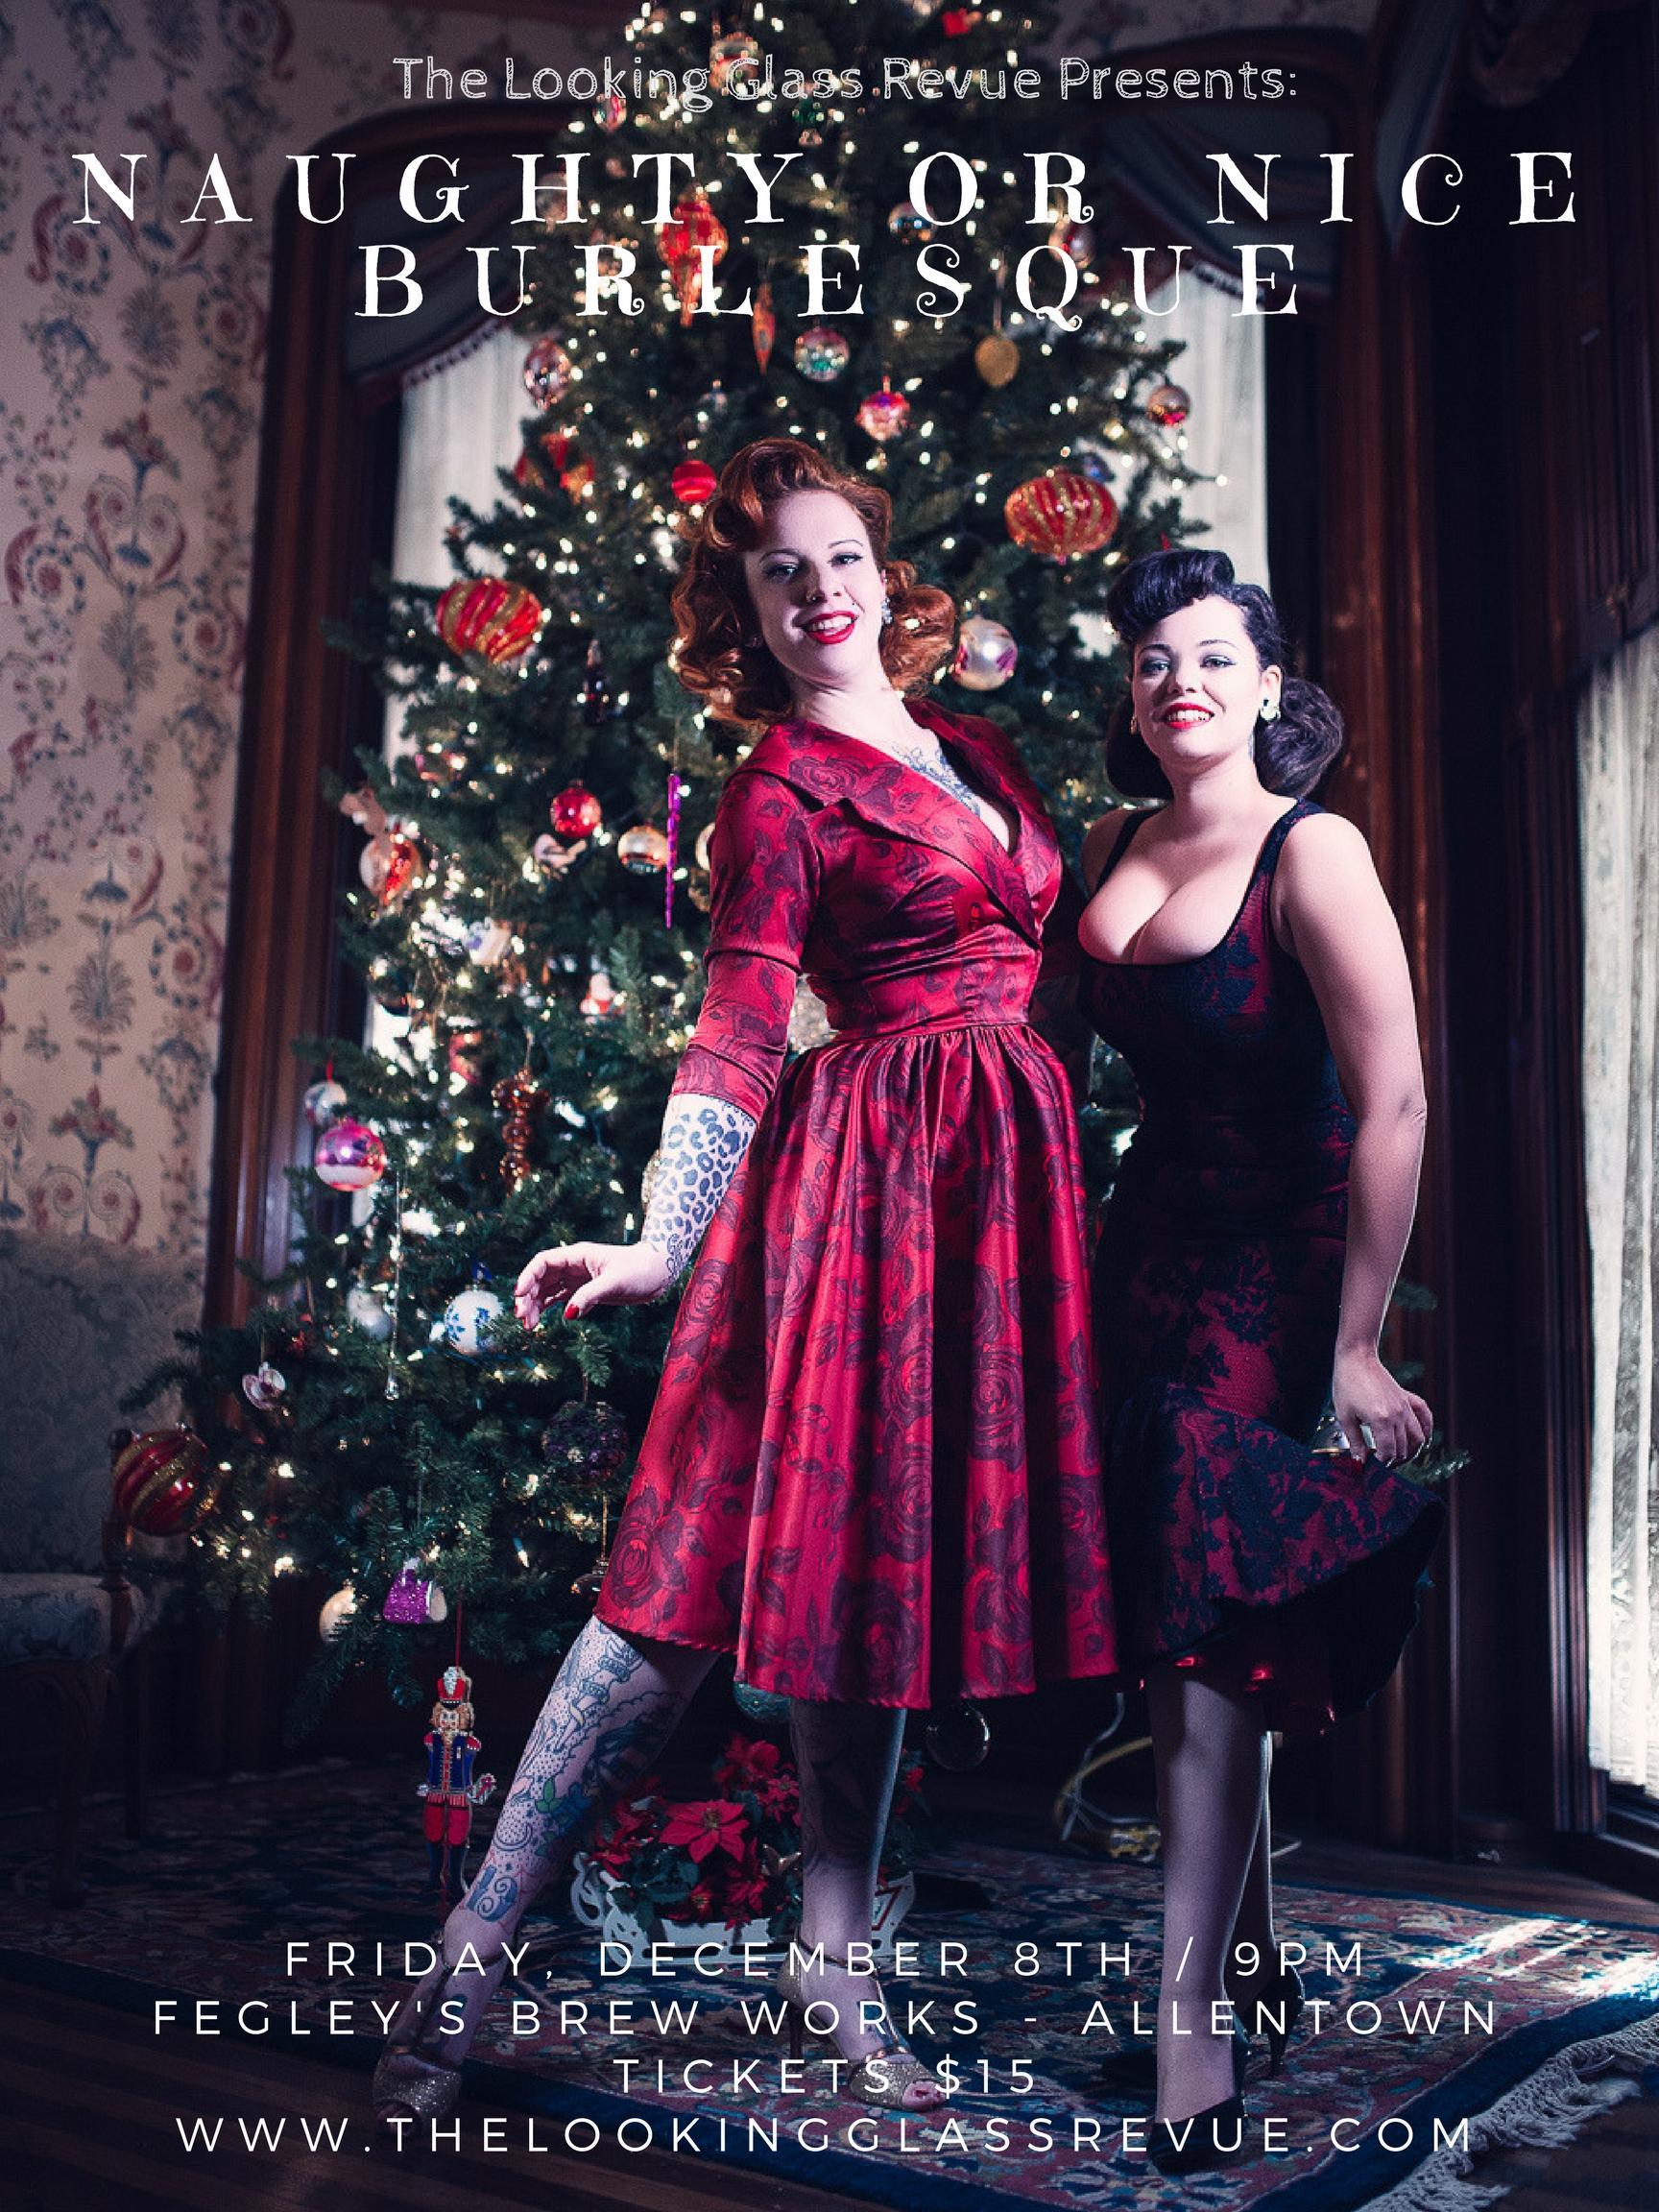 Naughty or nice burlesque.jpg